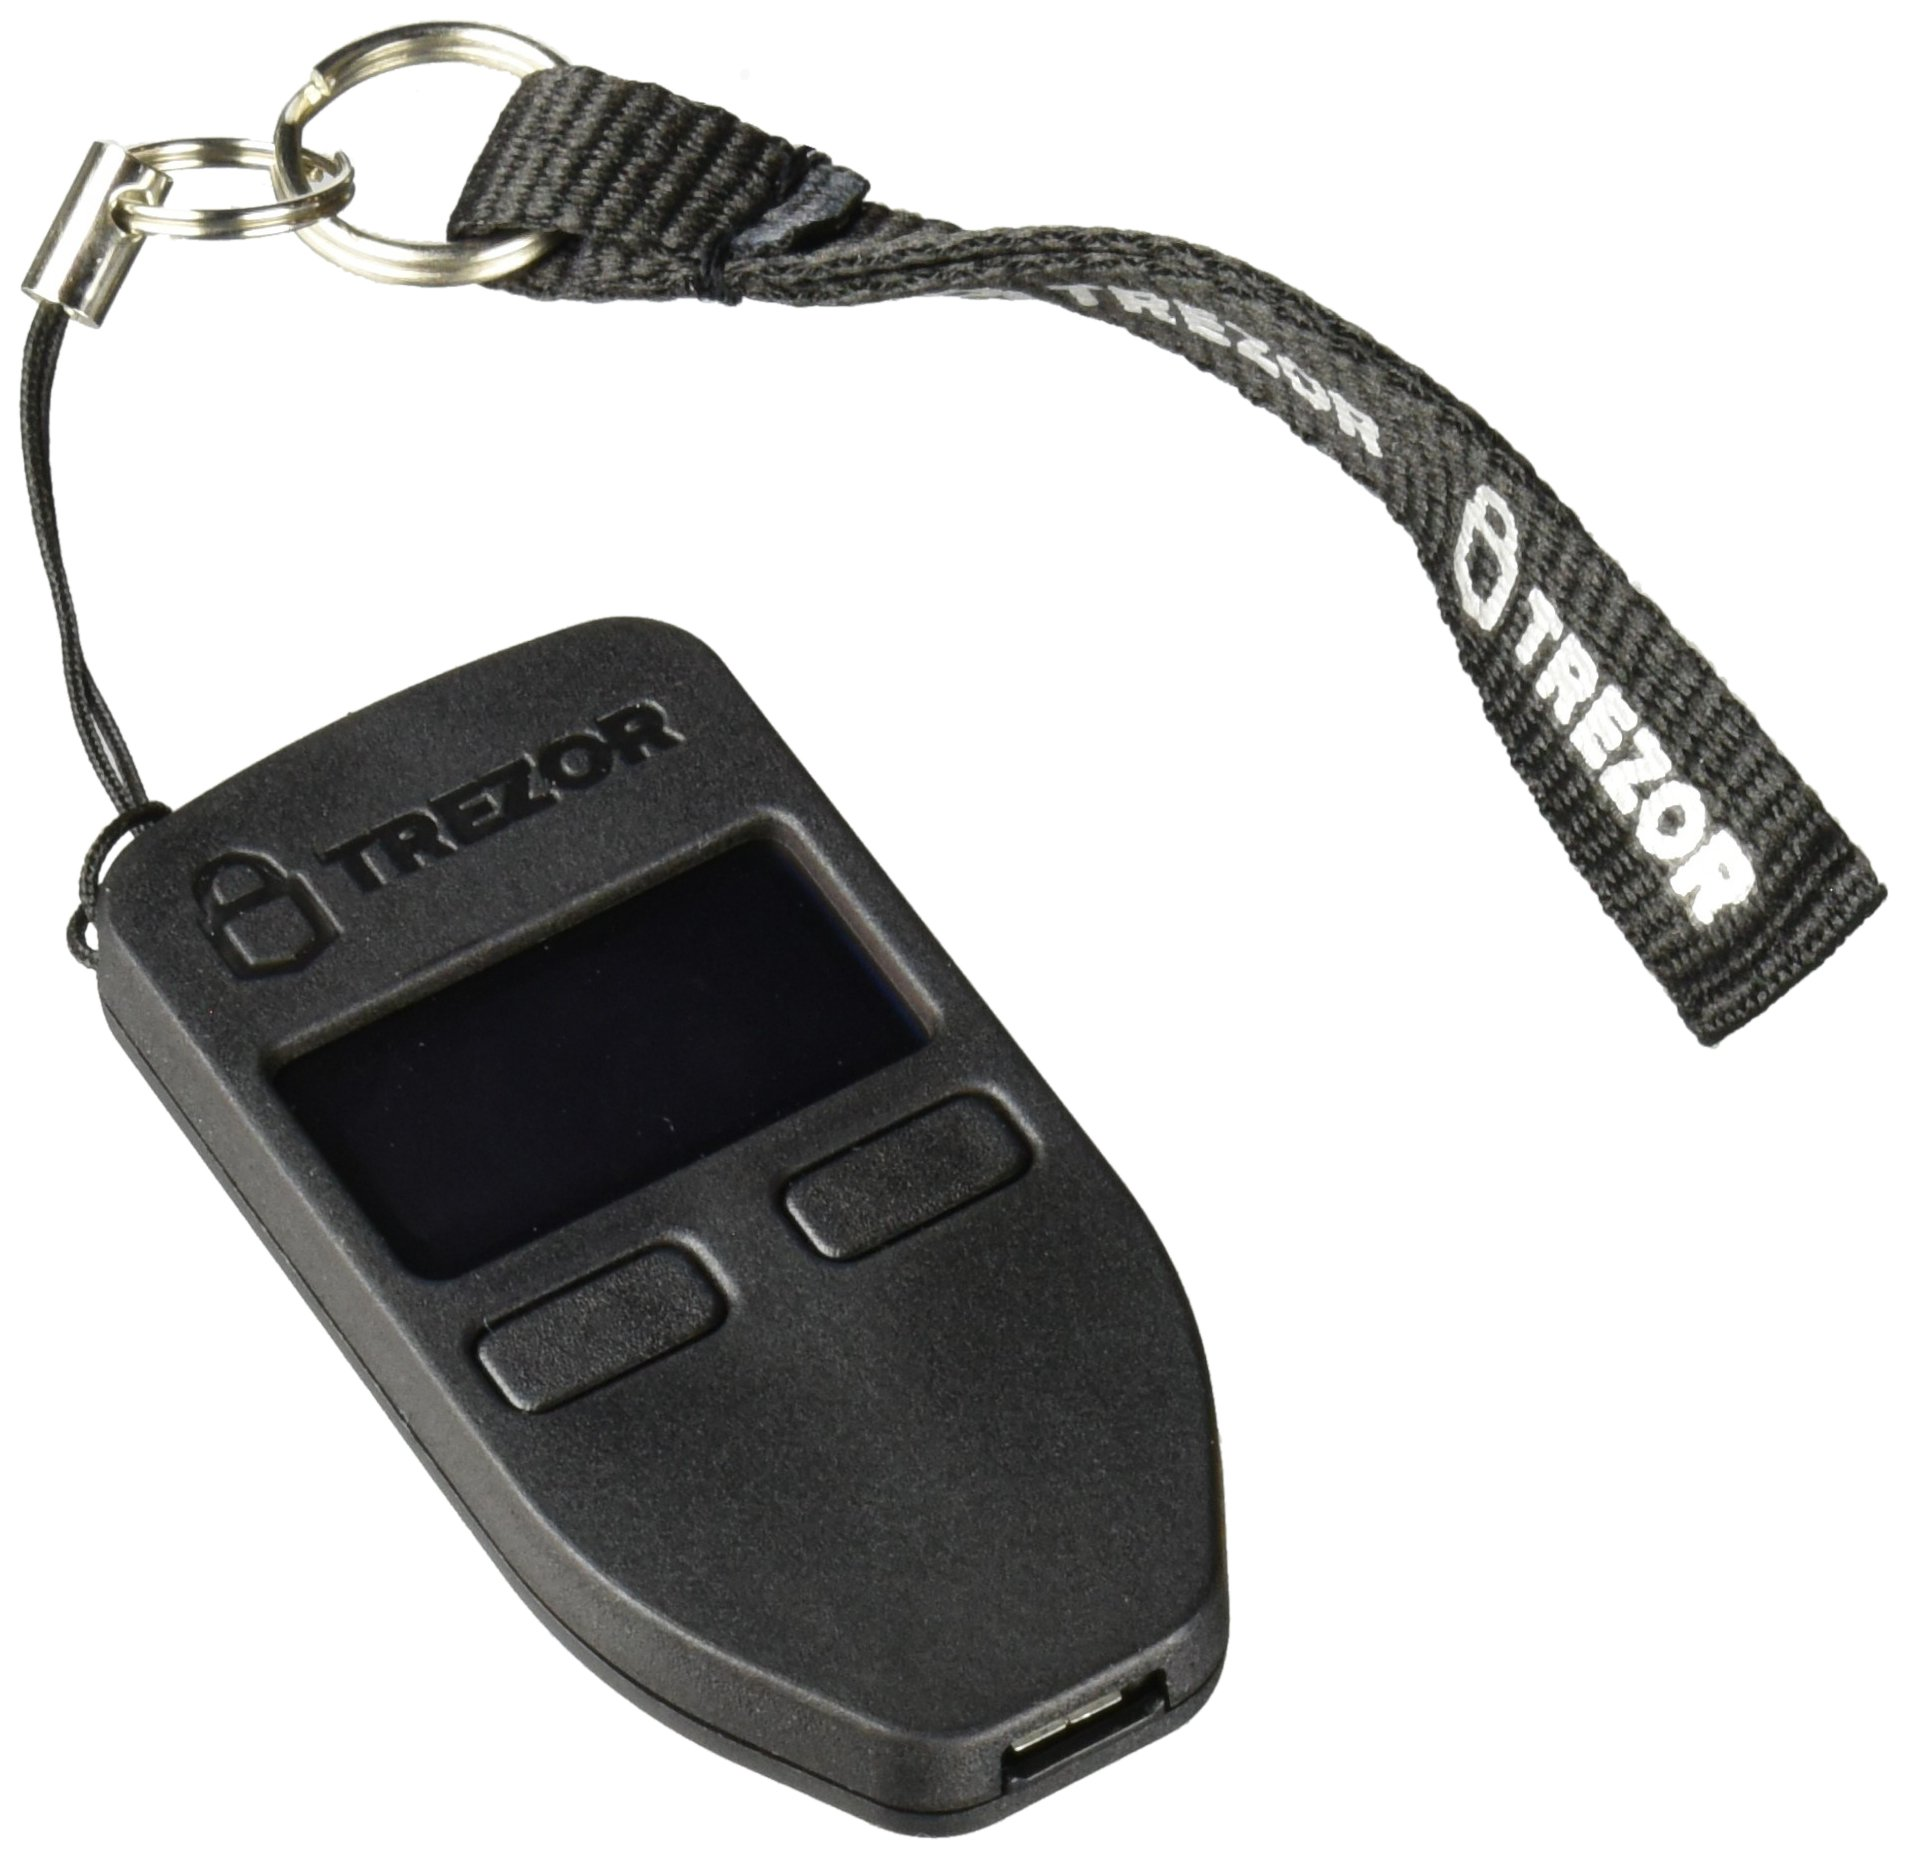 Trezor bitcoin wallet, Black by Trezor (Image #1)